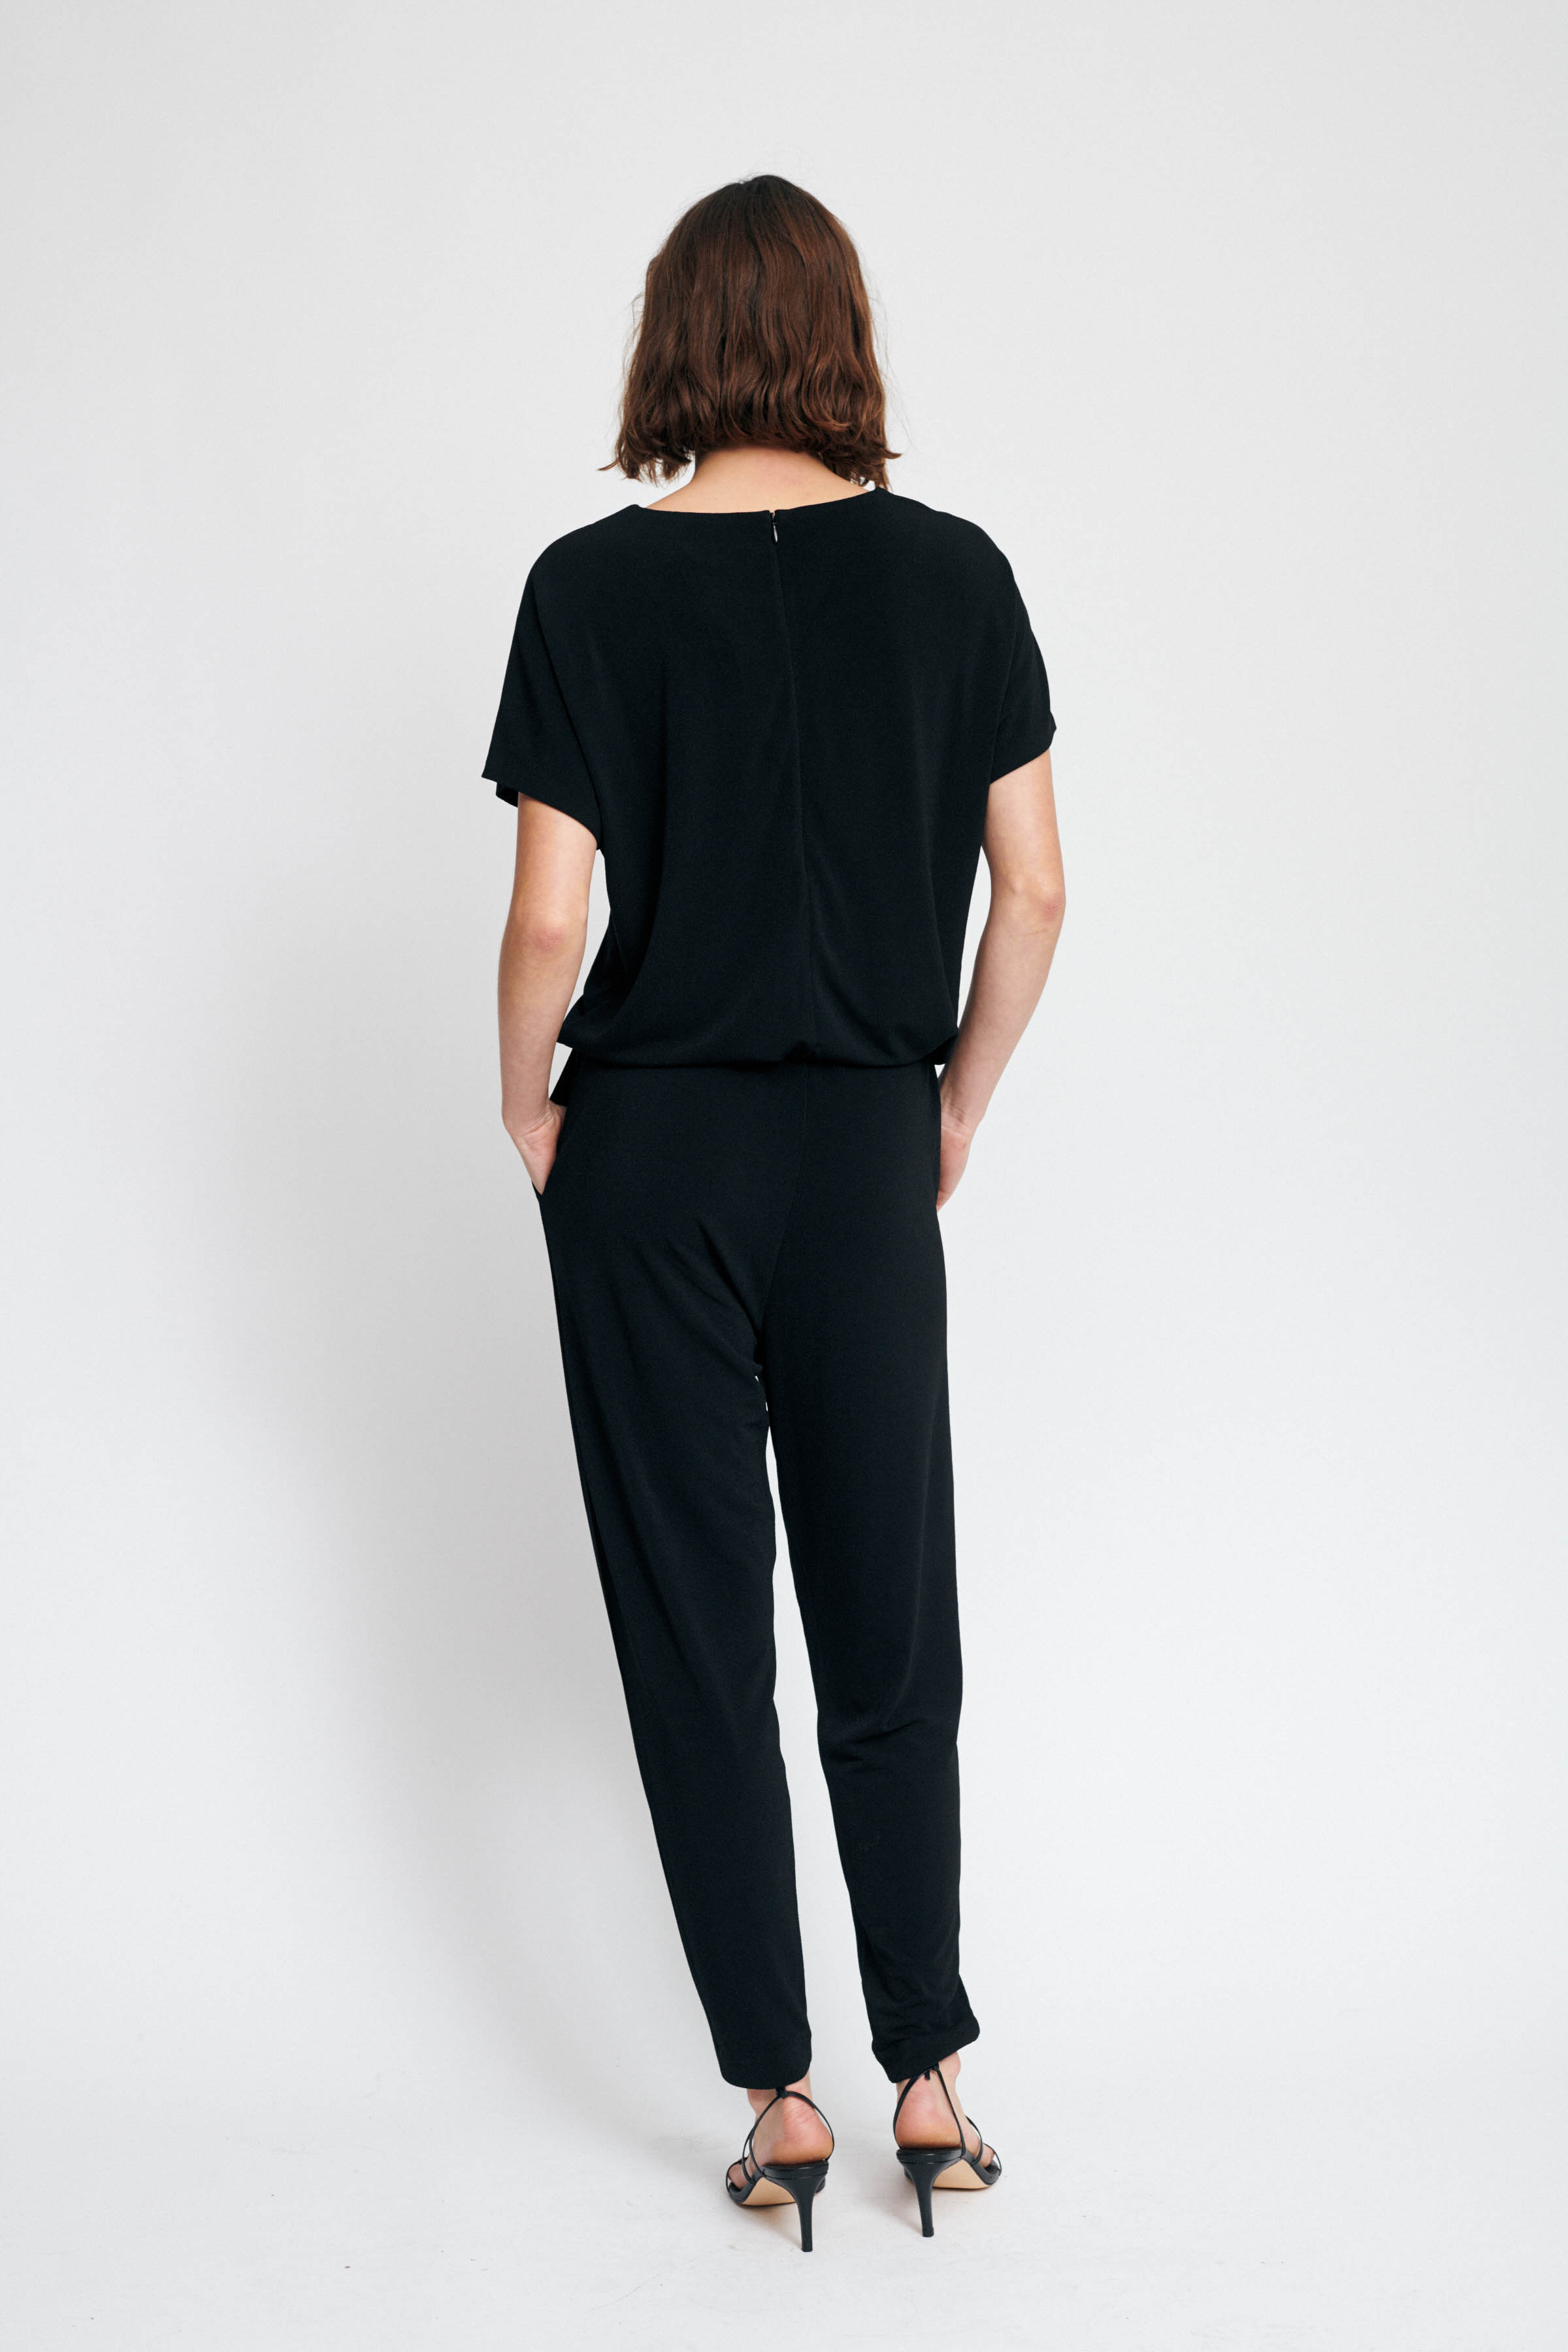 Black Casual buks – Køb Black Casual buks fra str. XXS-XXL her